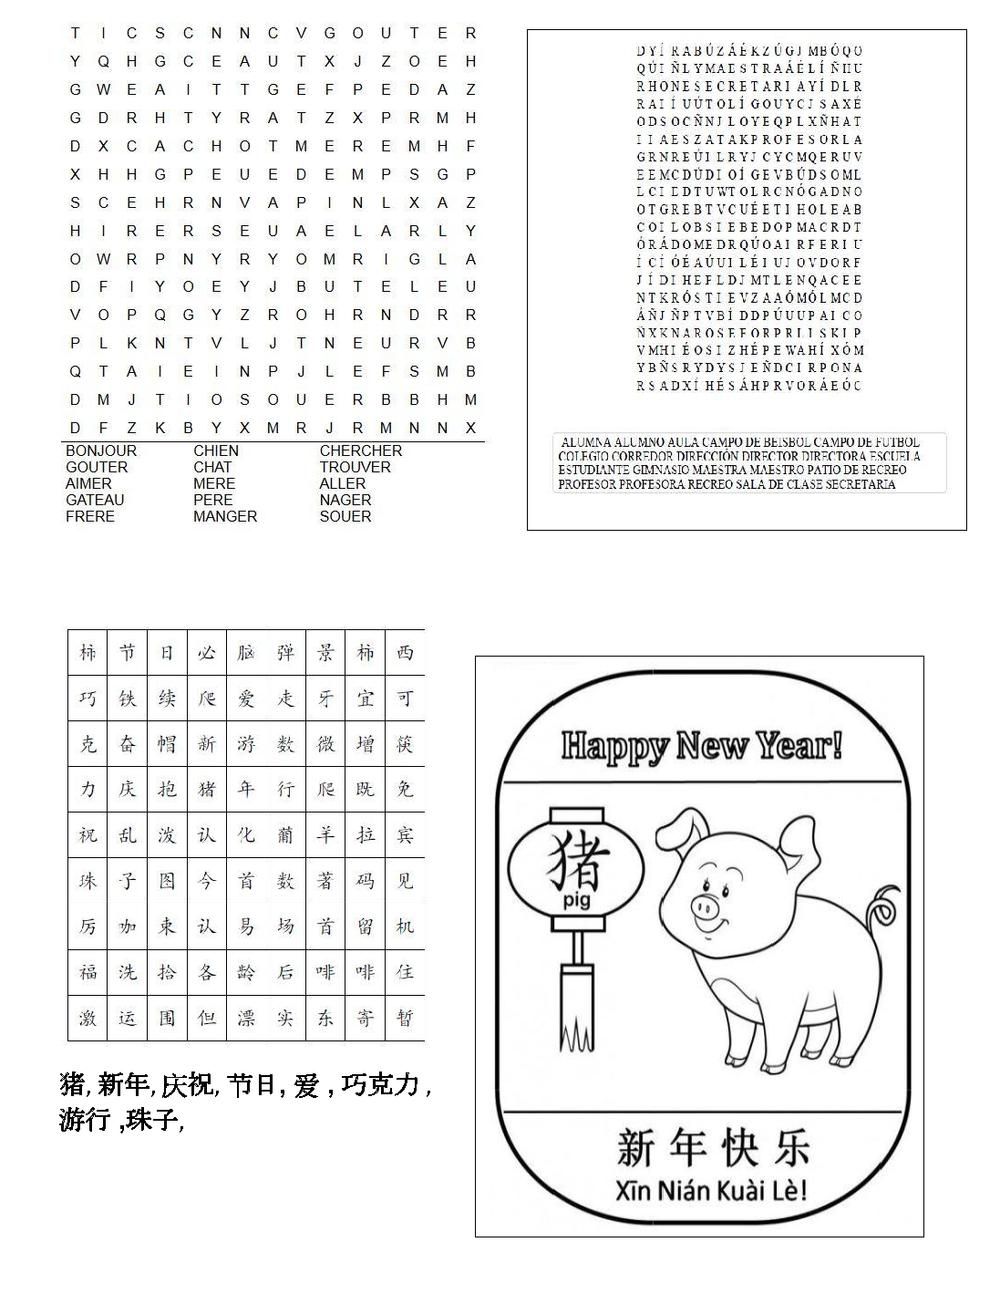 LangCom_Jan2019_Page_3.png